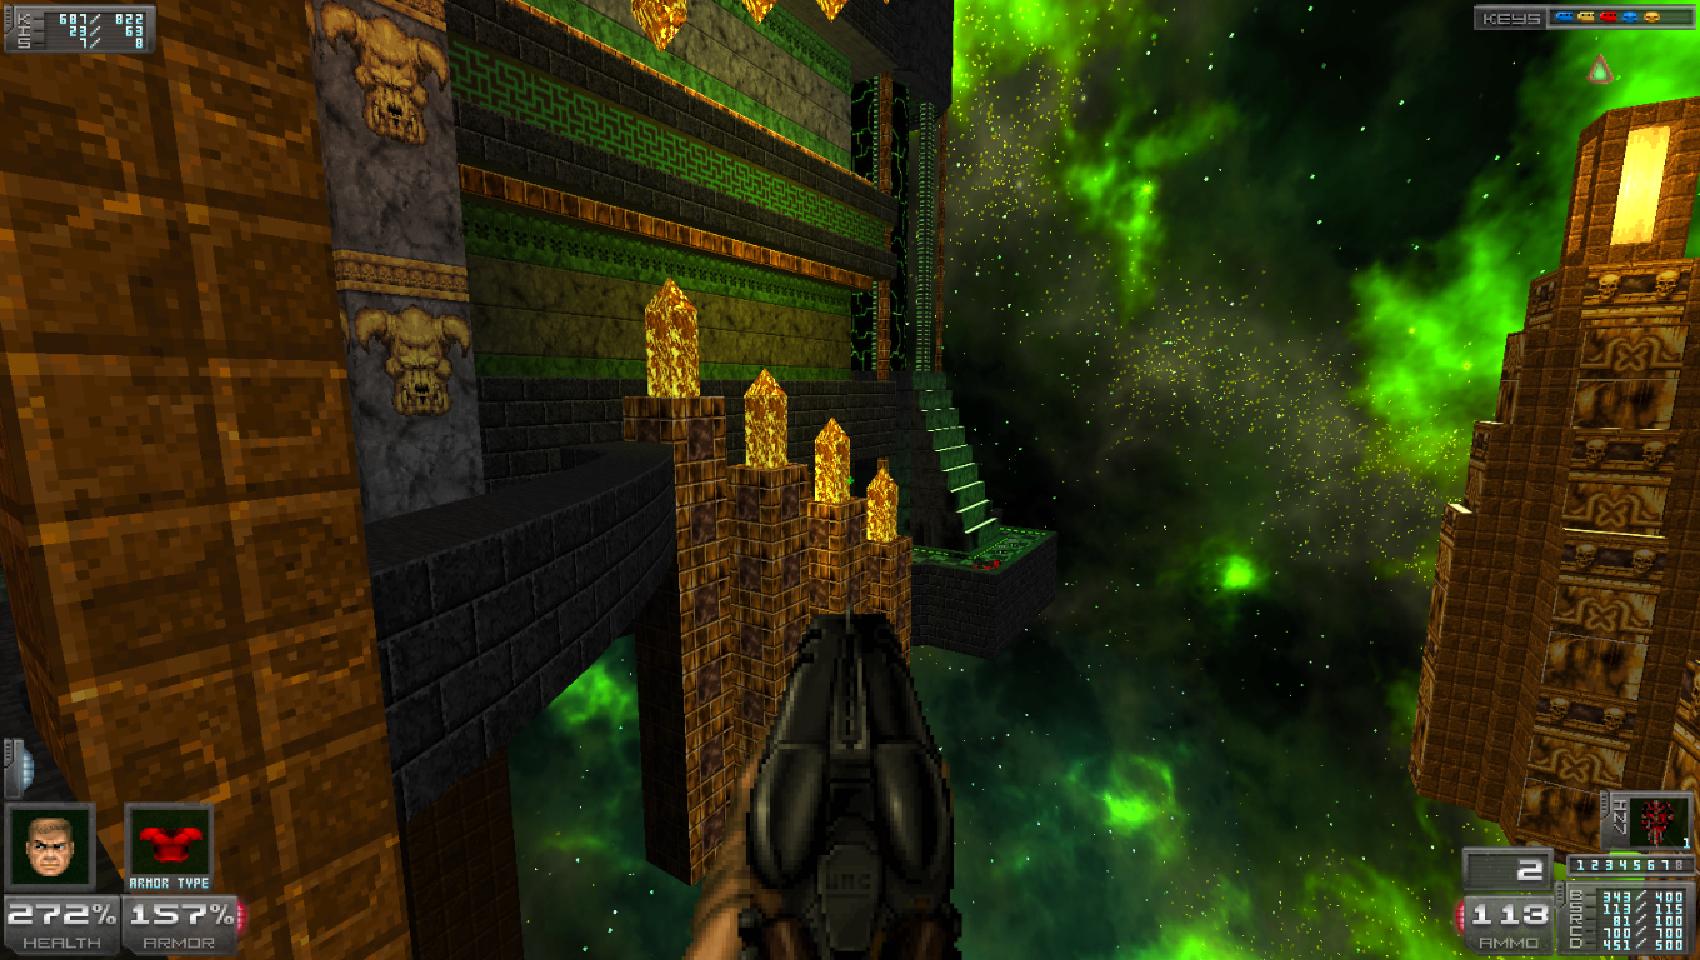 Screenshot_Doom_20200530_111718.png.c481e6b6a2a8518f2afbe70ba320d39d.png